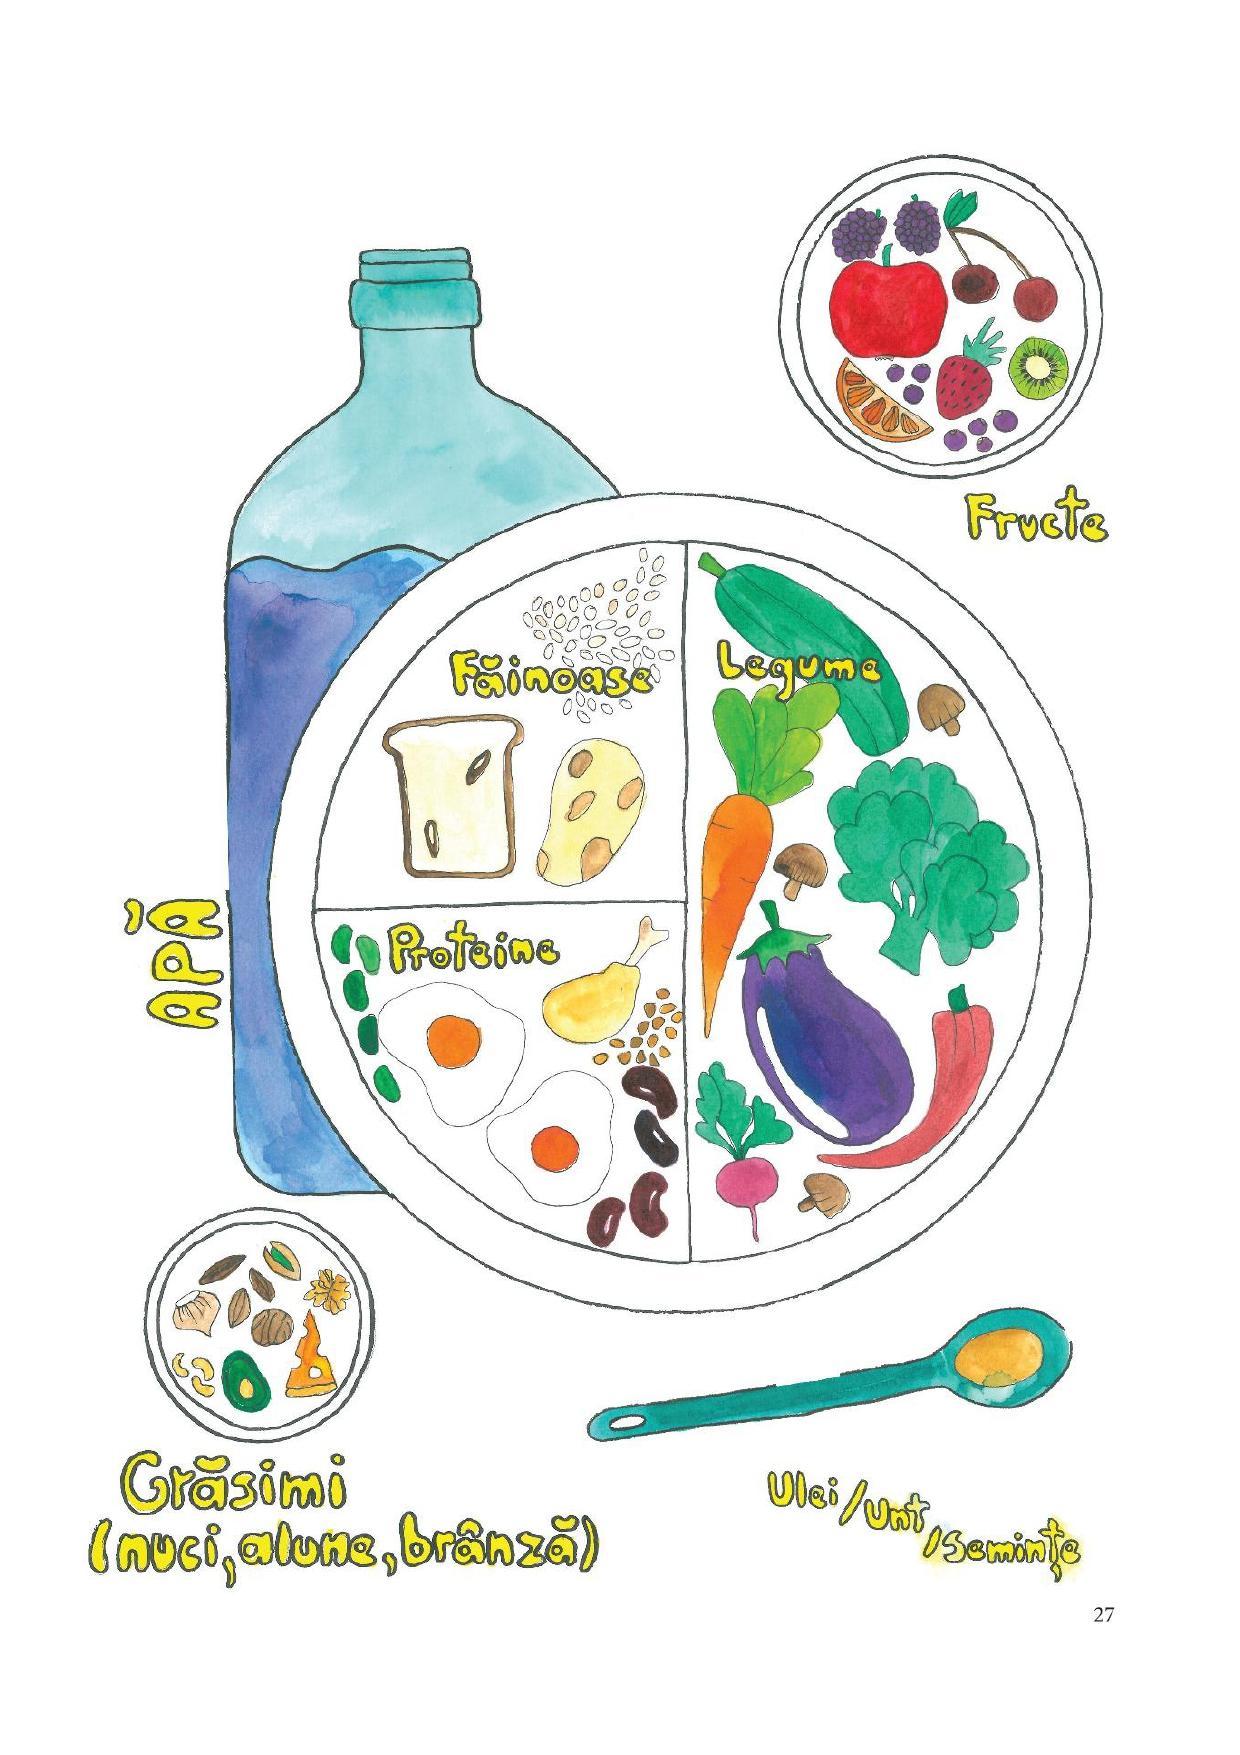 Povestea lui Mofturos - Ghid povestit de nutritie_page-0029